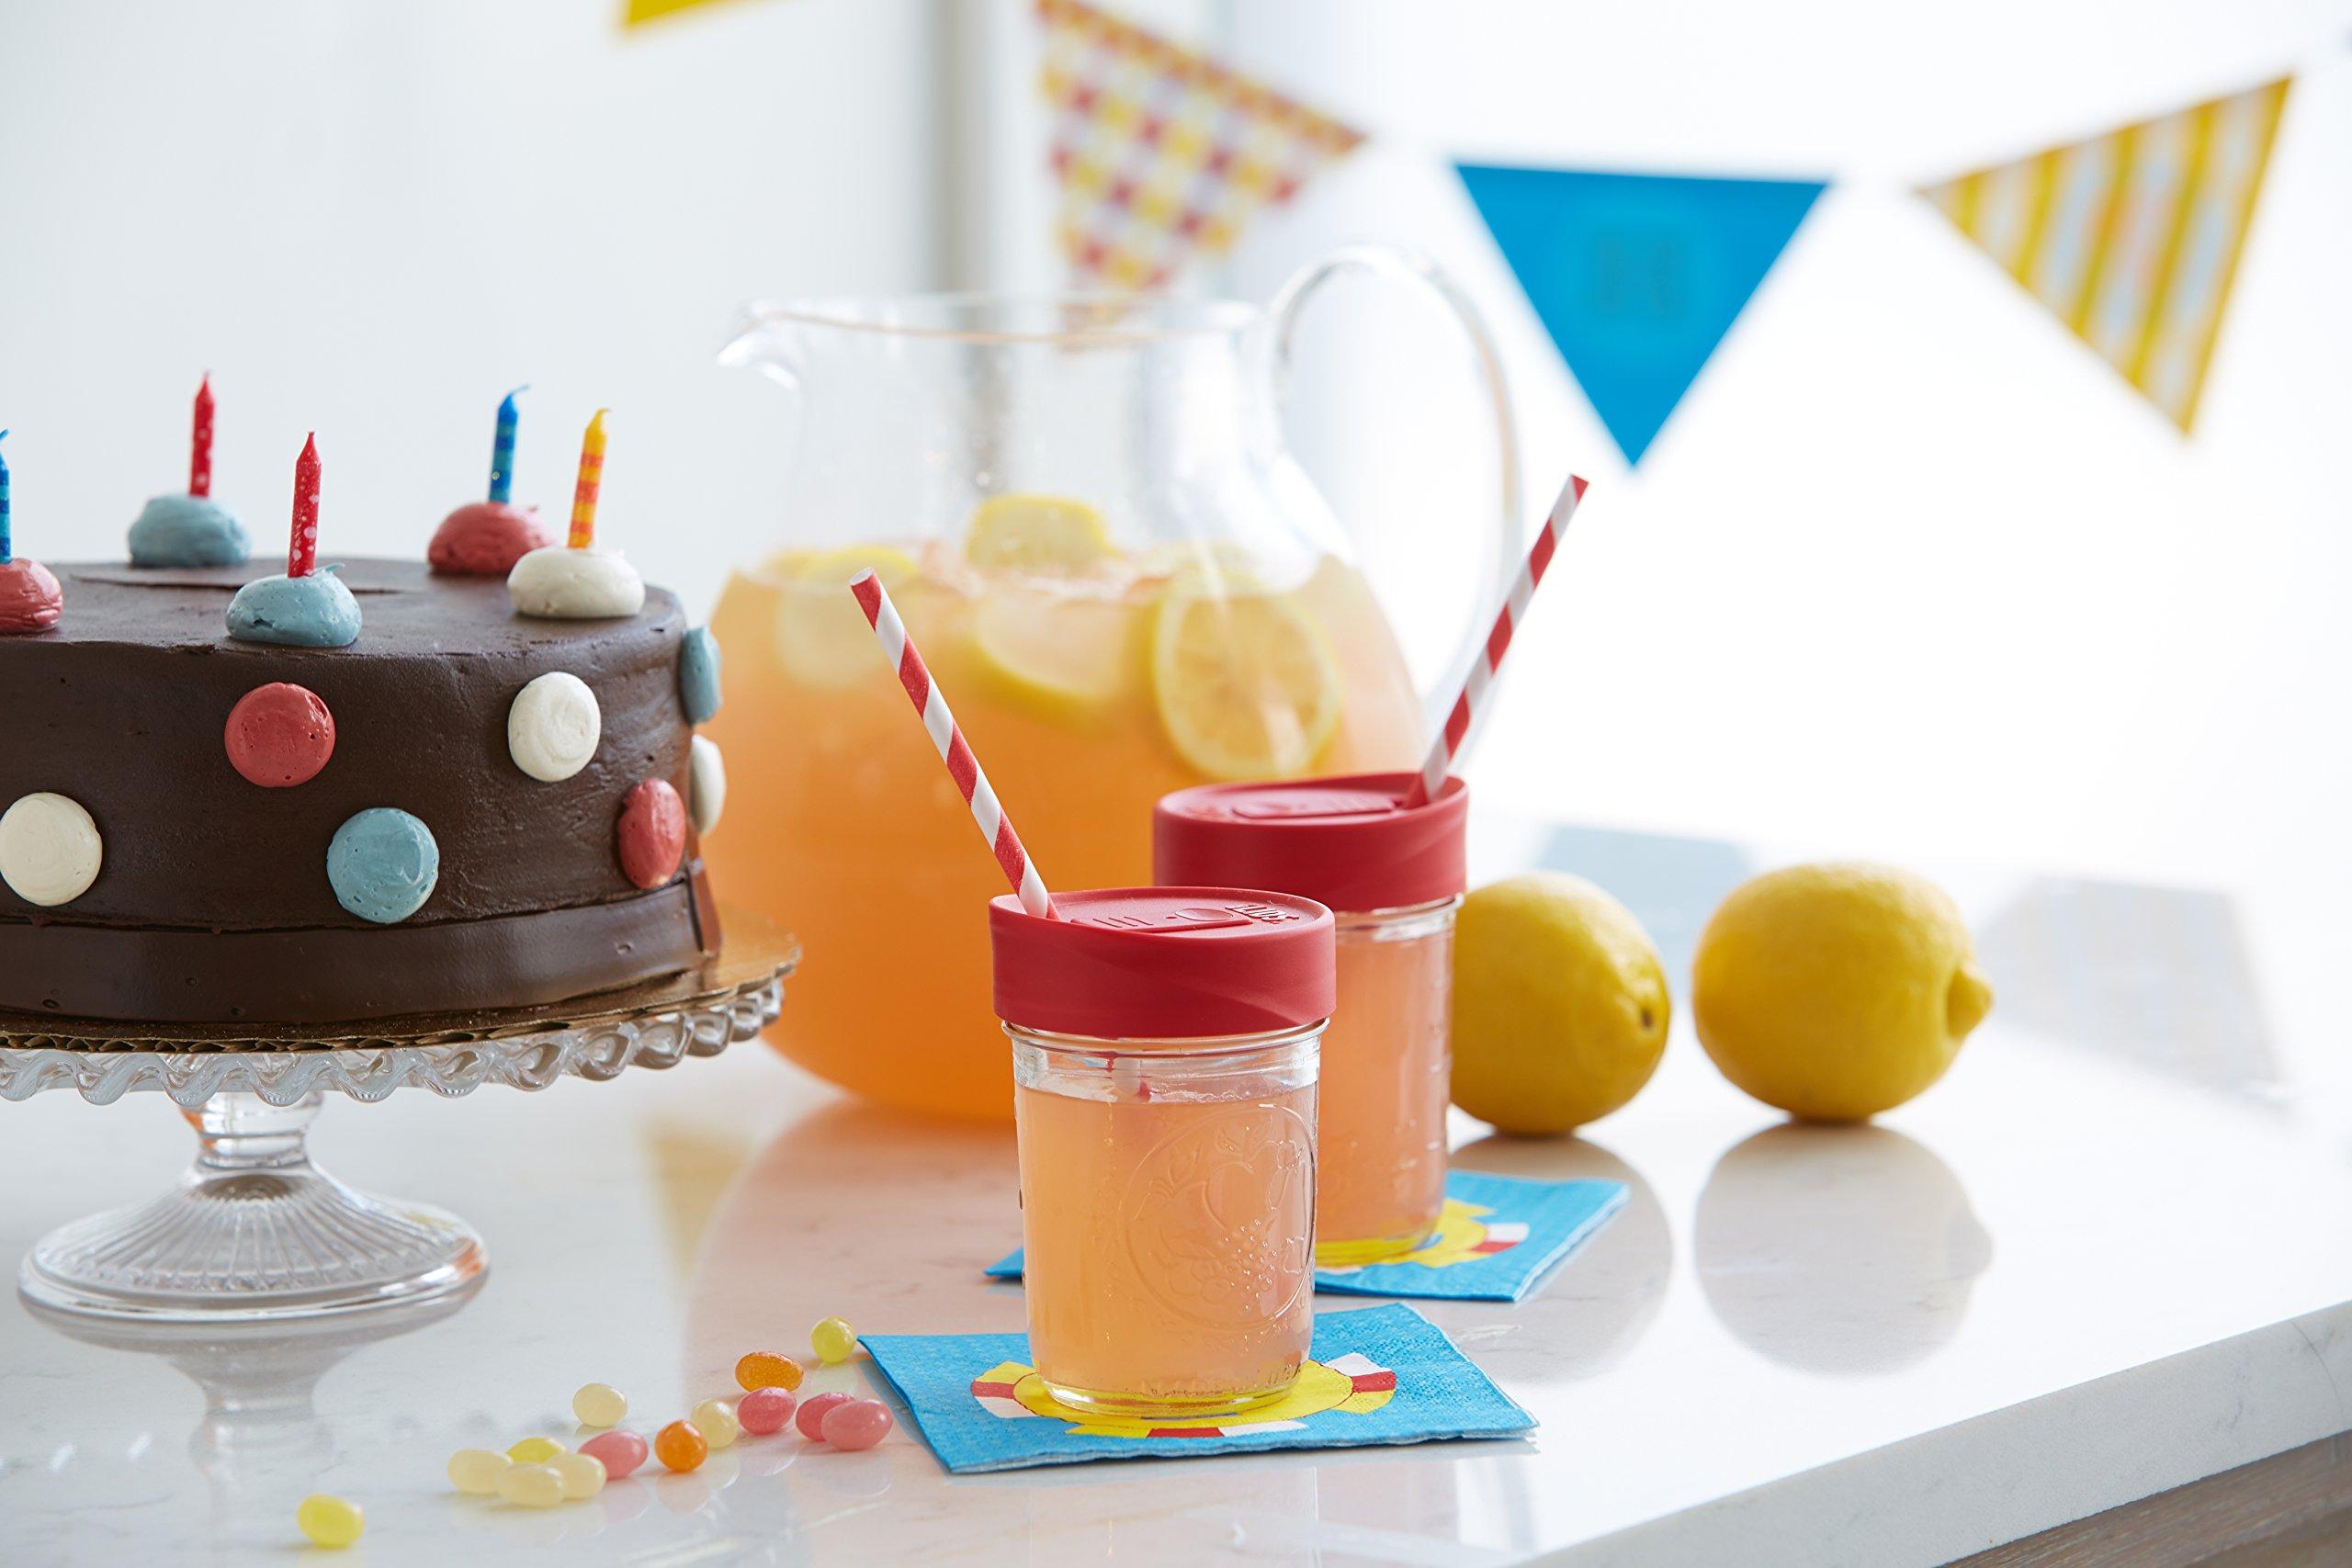 iLIDS Mason Jar Drink Lid, Wide Mouth, Classic Colors, 6-Pack by iLIDS (Image #2)